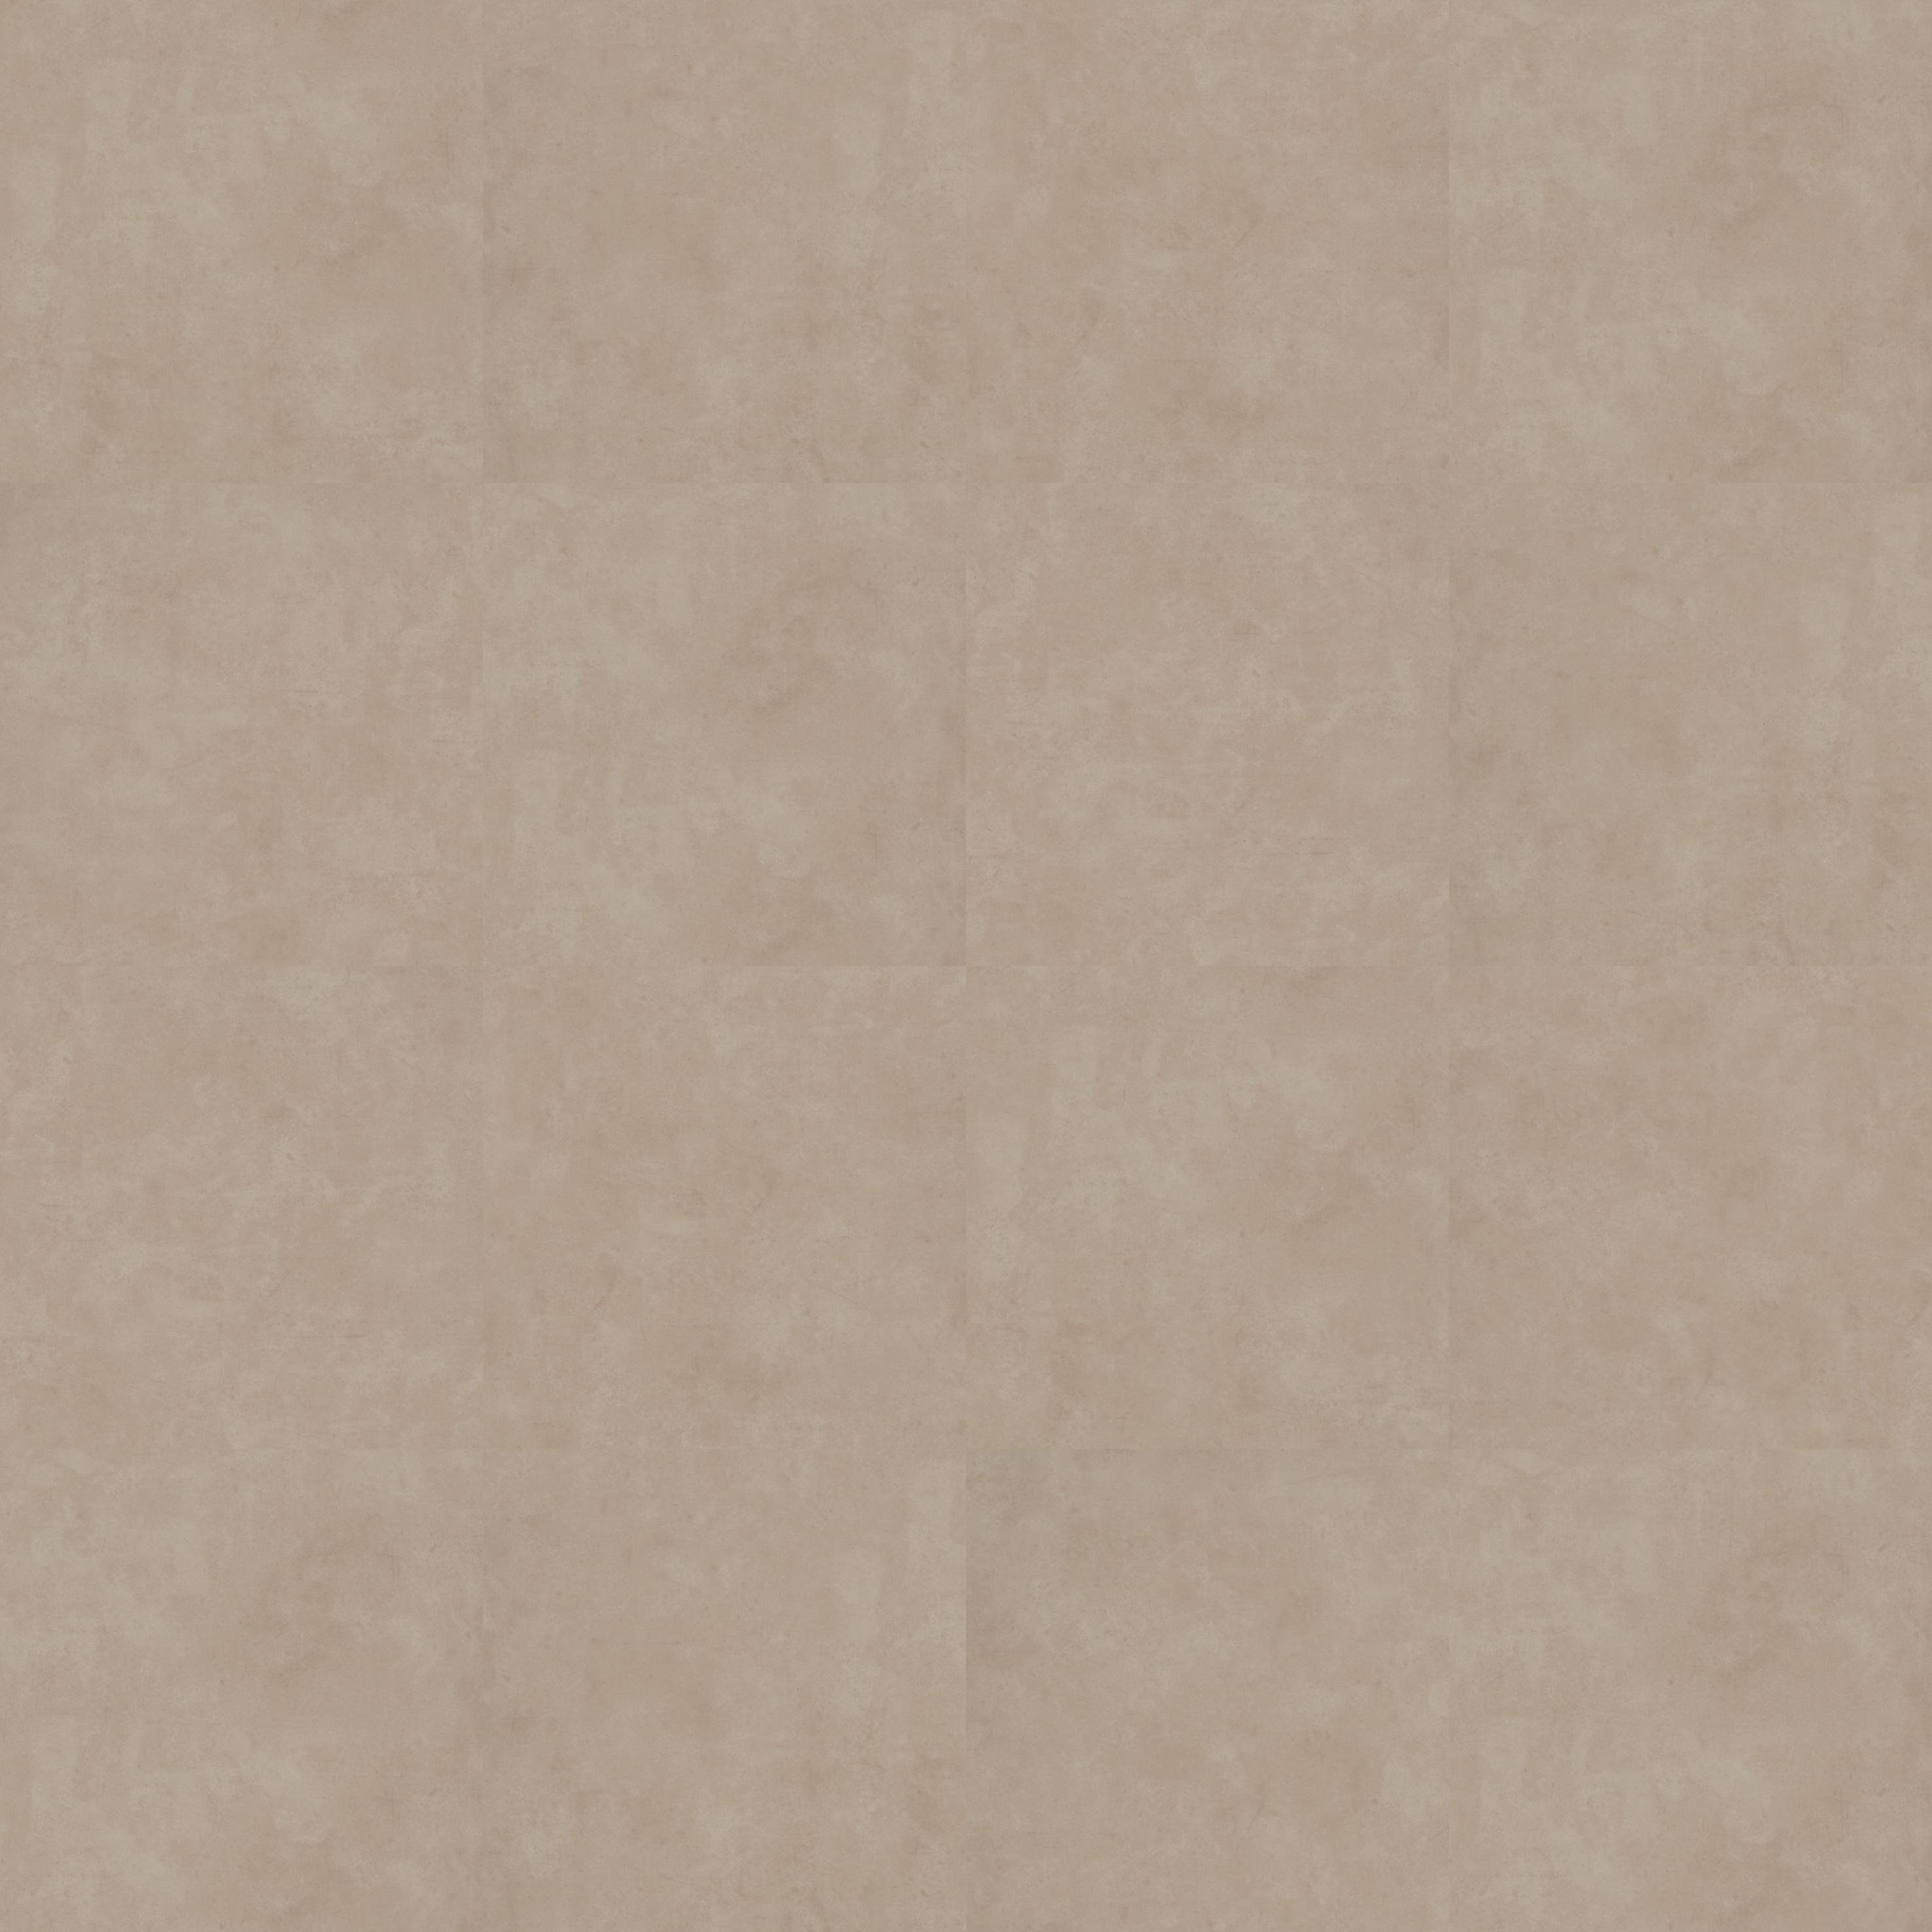 Pergo Flooring Types >> Allura Flex Stone loose lay tiles | Forbo Flooring Systems